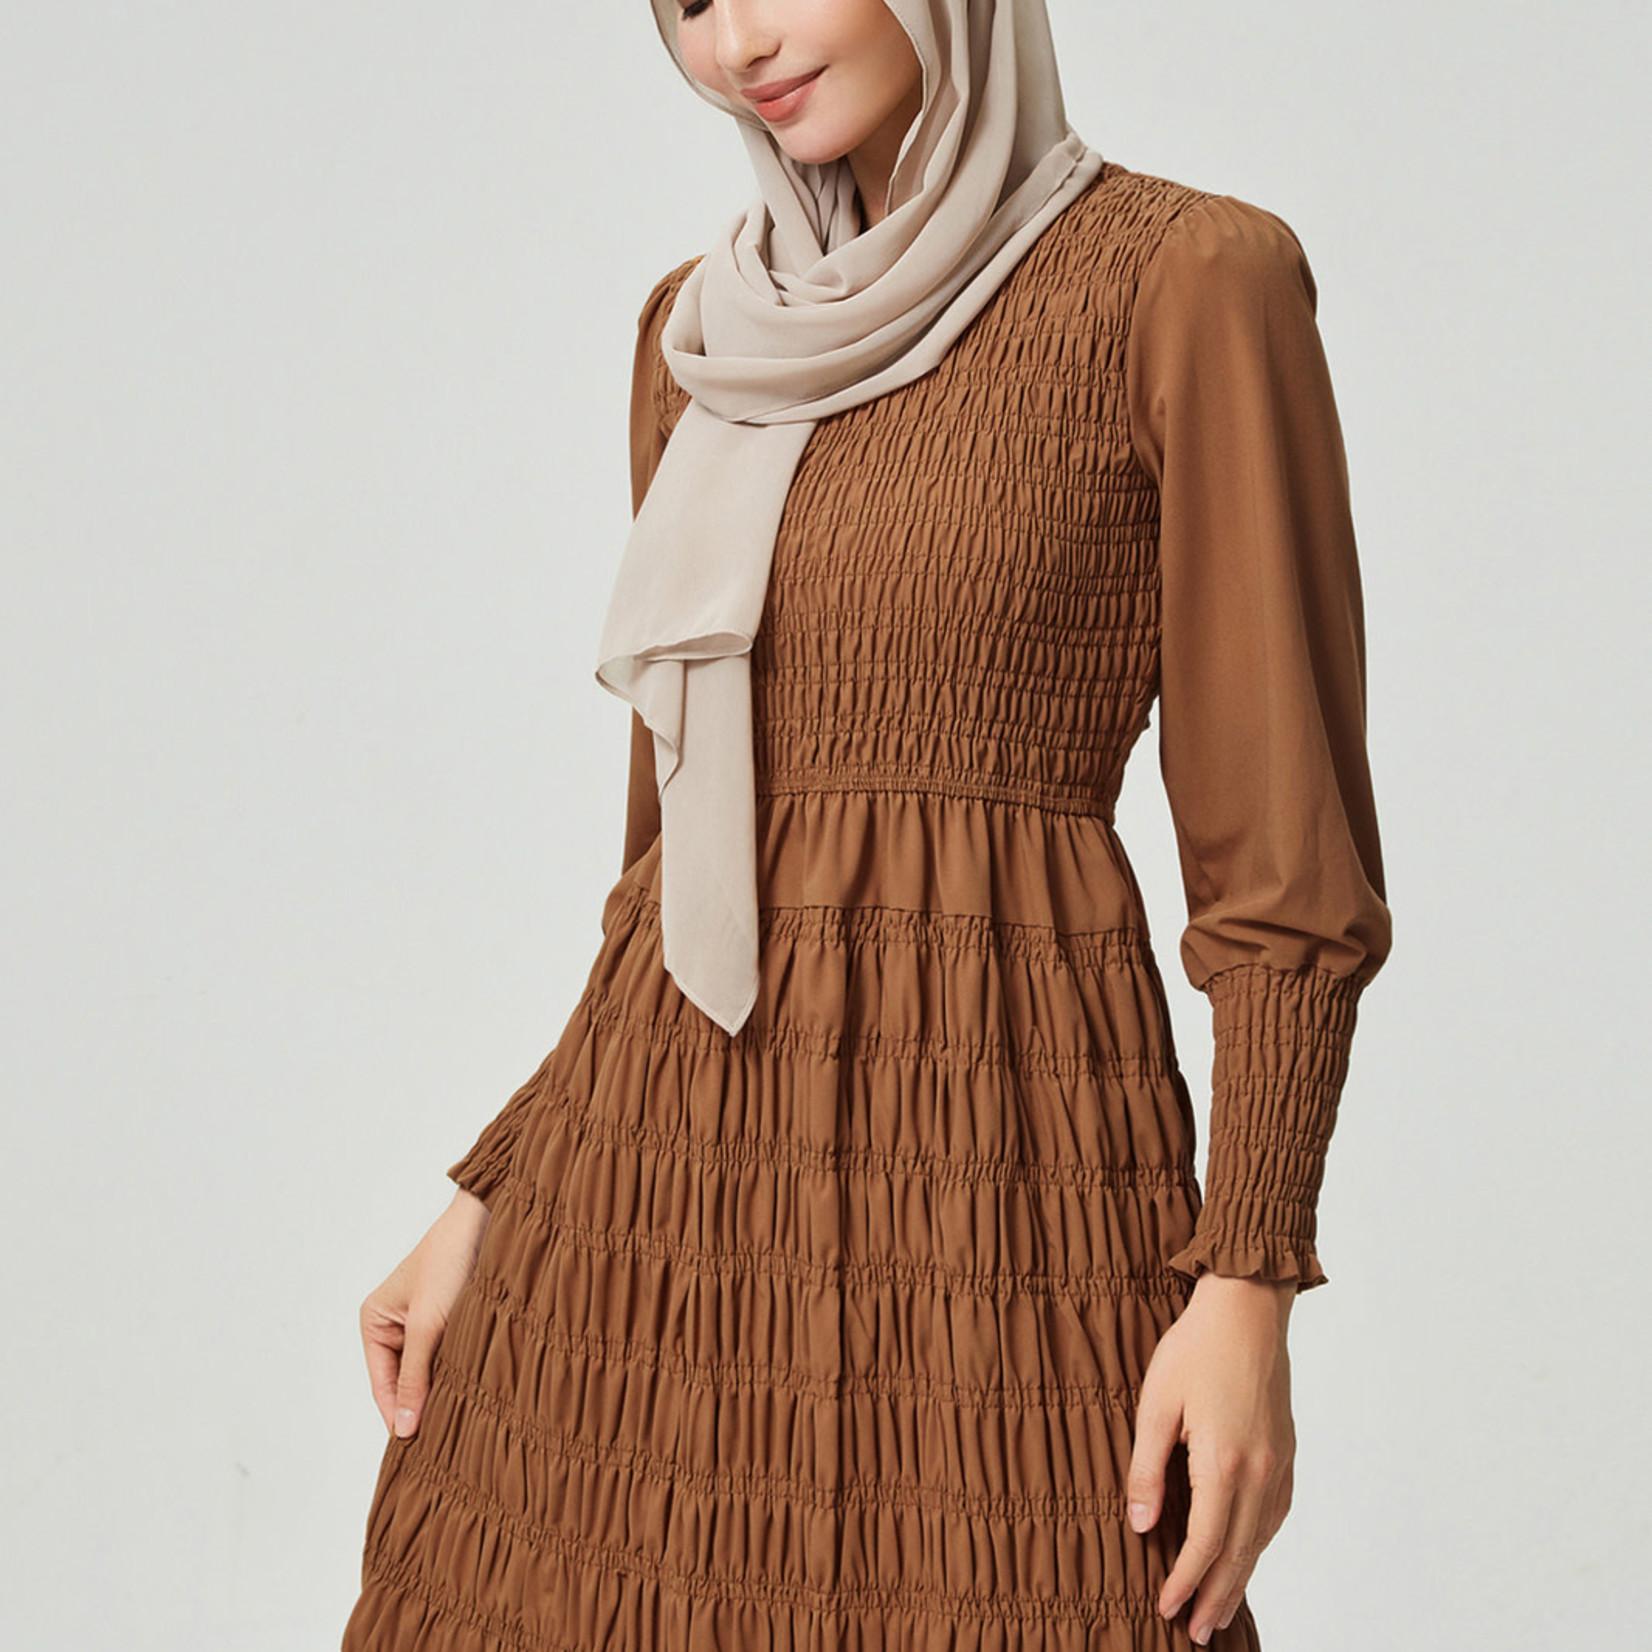 Hijab House Camel Shirred Dress